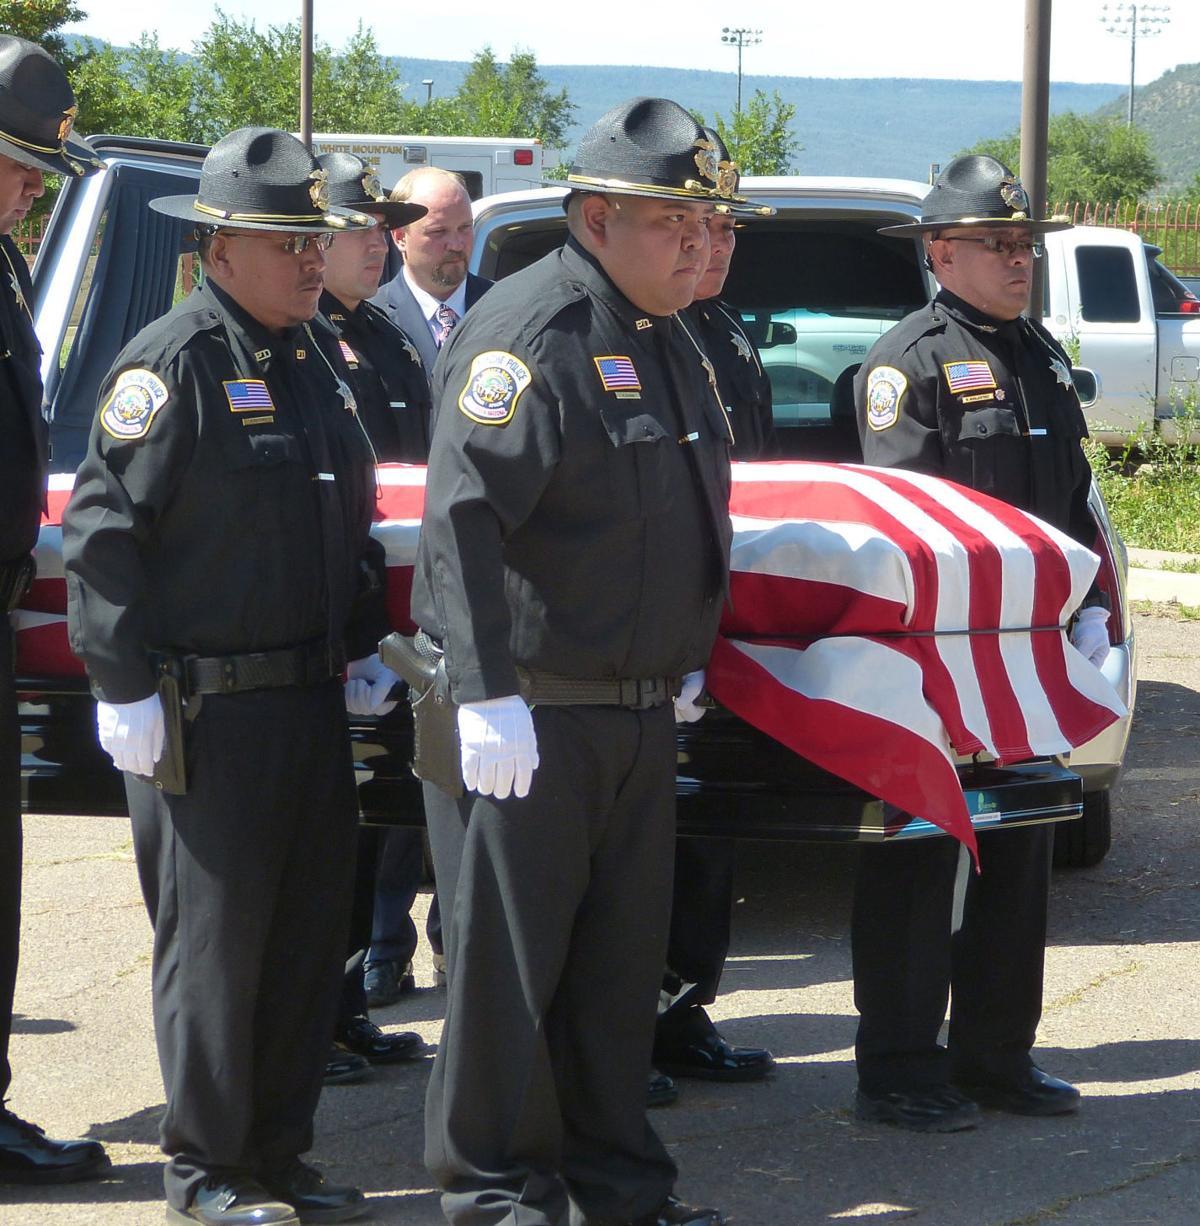 Lupe casket